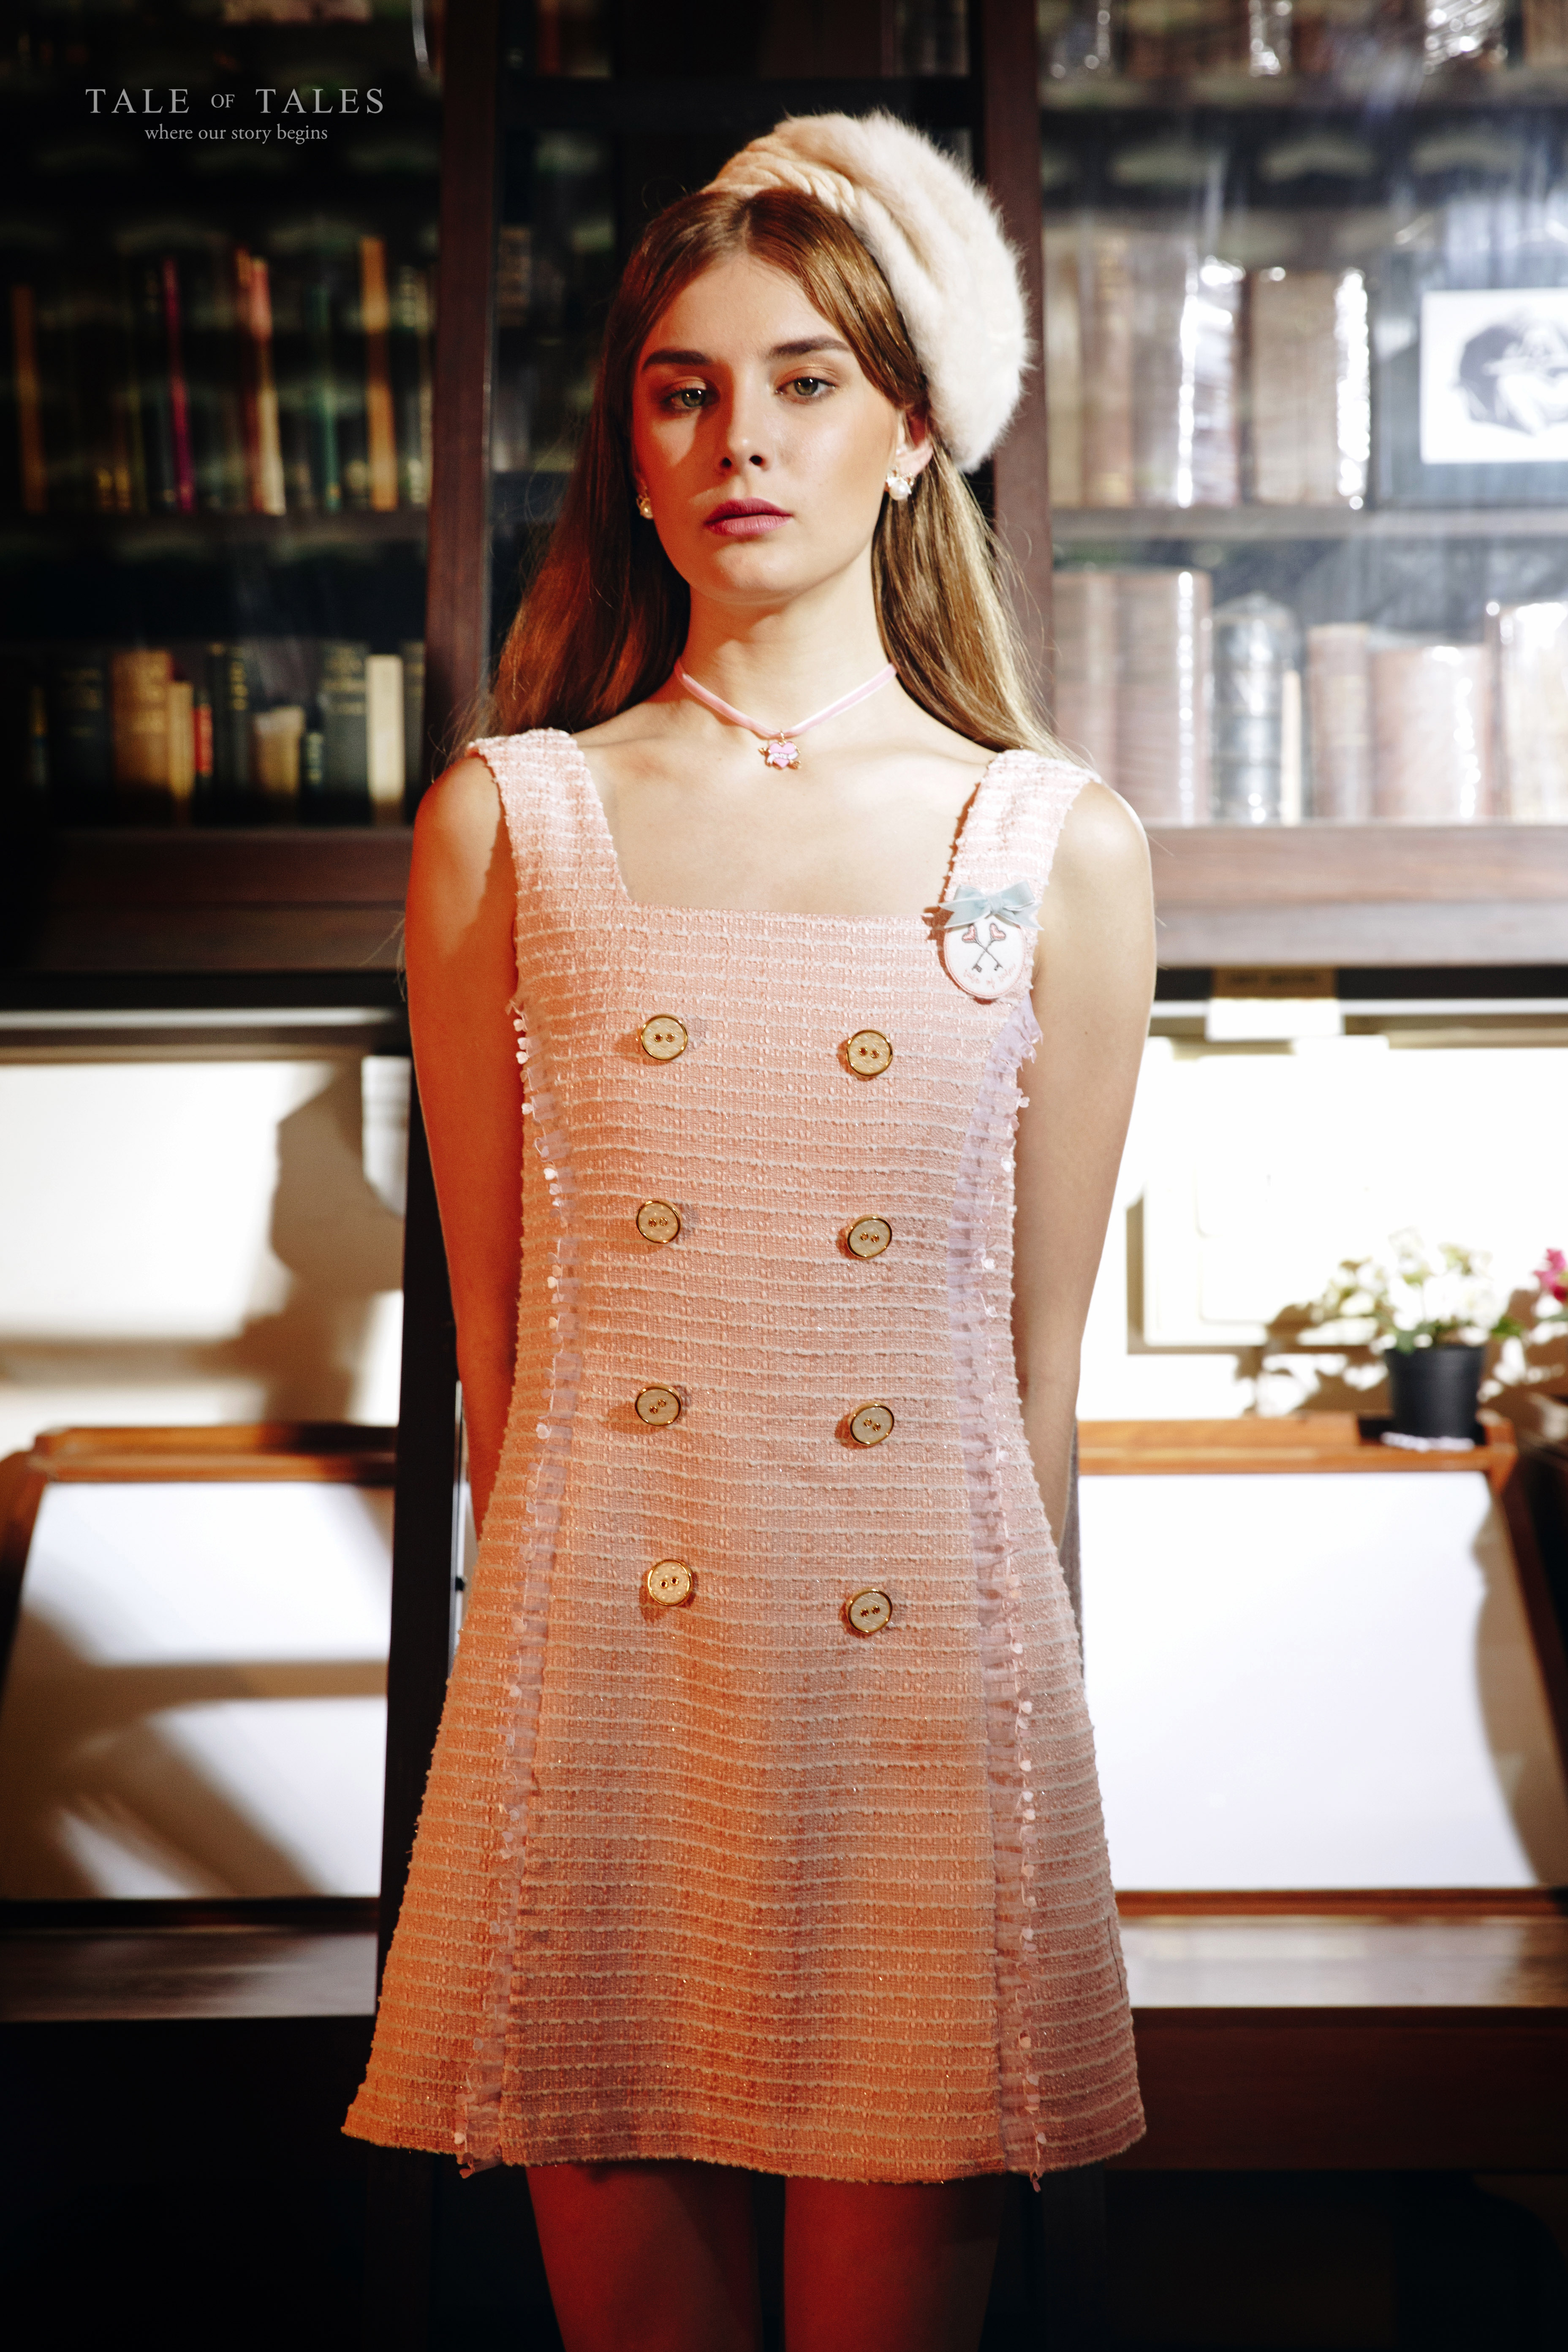 taleoftales,fashion,fairytale,cutie,sweet,modern,feminine,lovely,chic,handmade,grey,embroidery,details,design,vintage,thaidesign